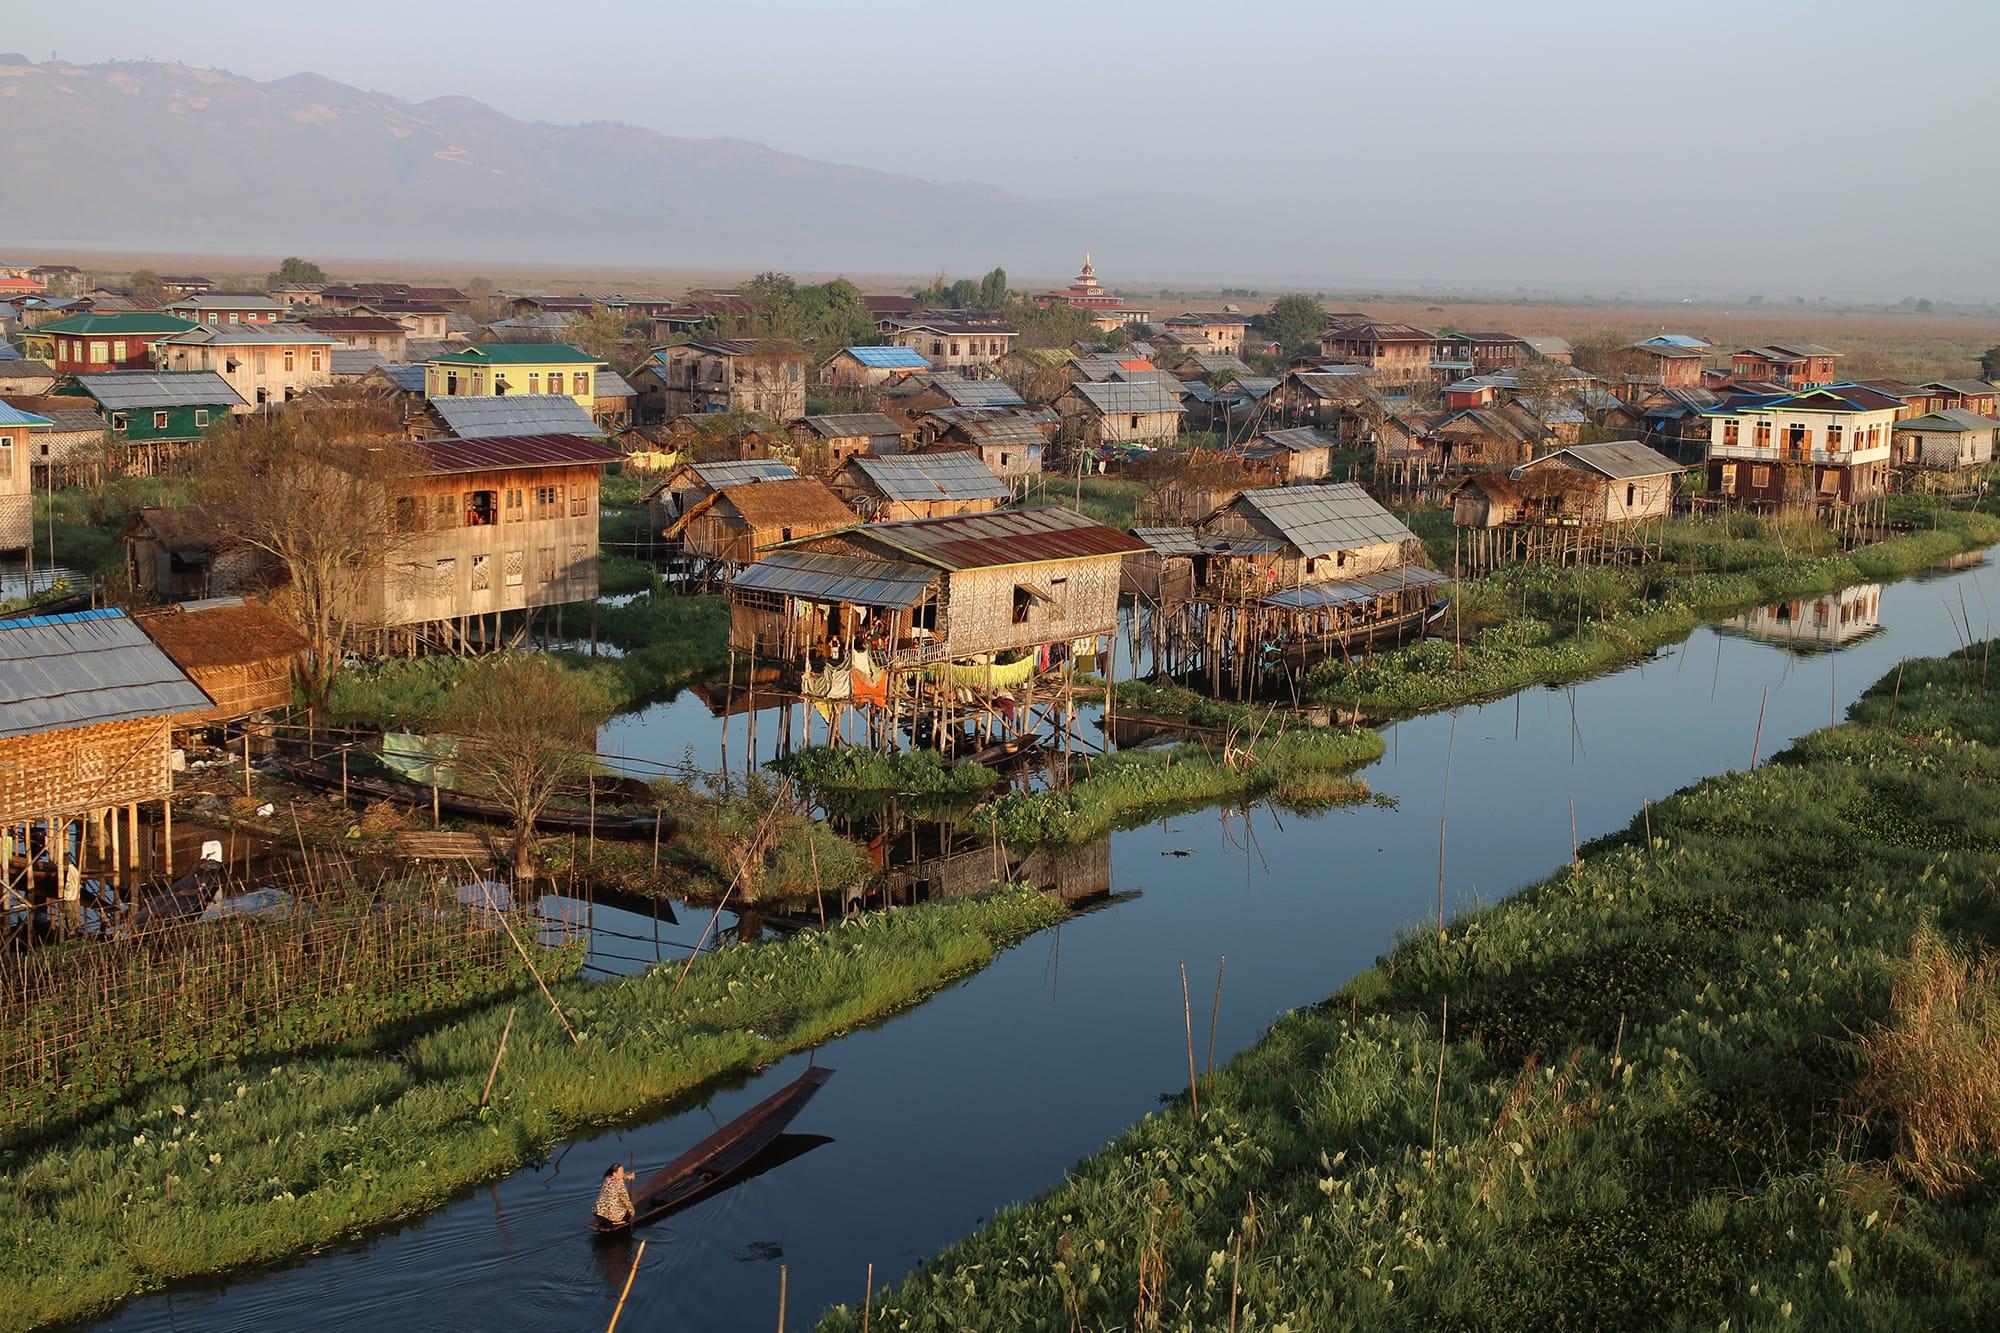 Stilted village on the edge of Inle Lake, Myanmar